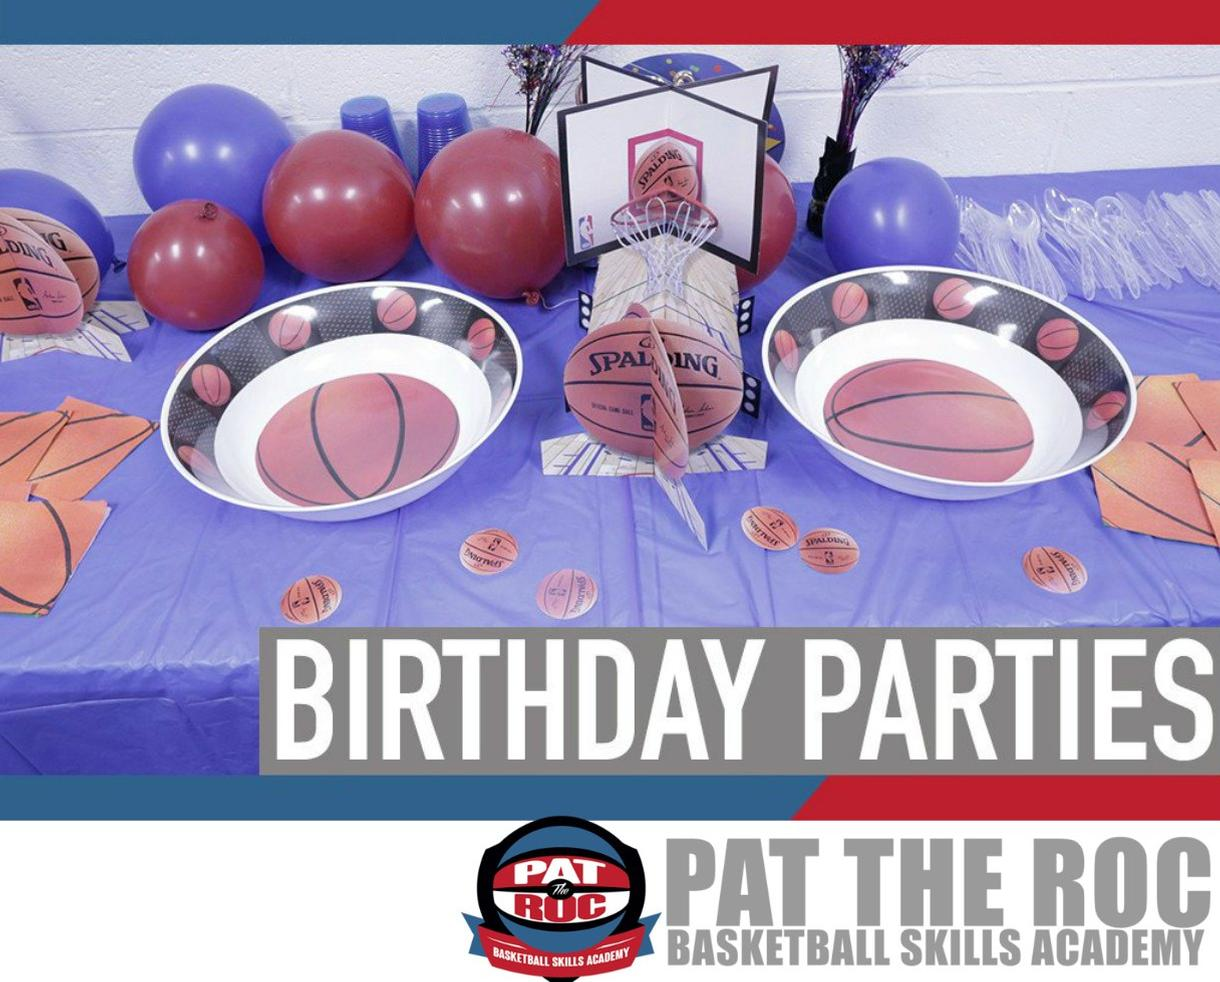 Pat the Roc Basketball Skills Academy Birthday Party